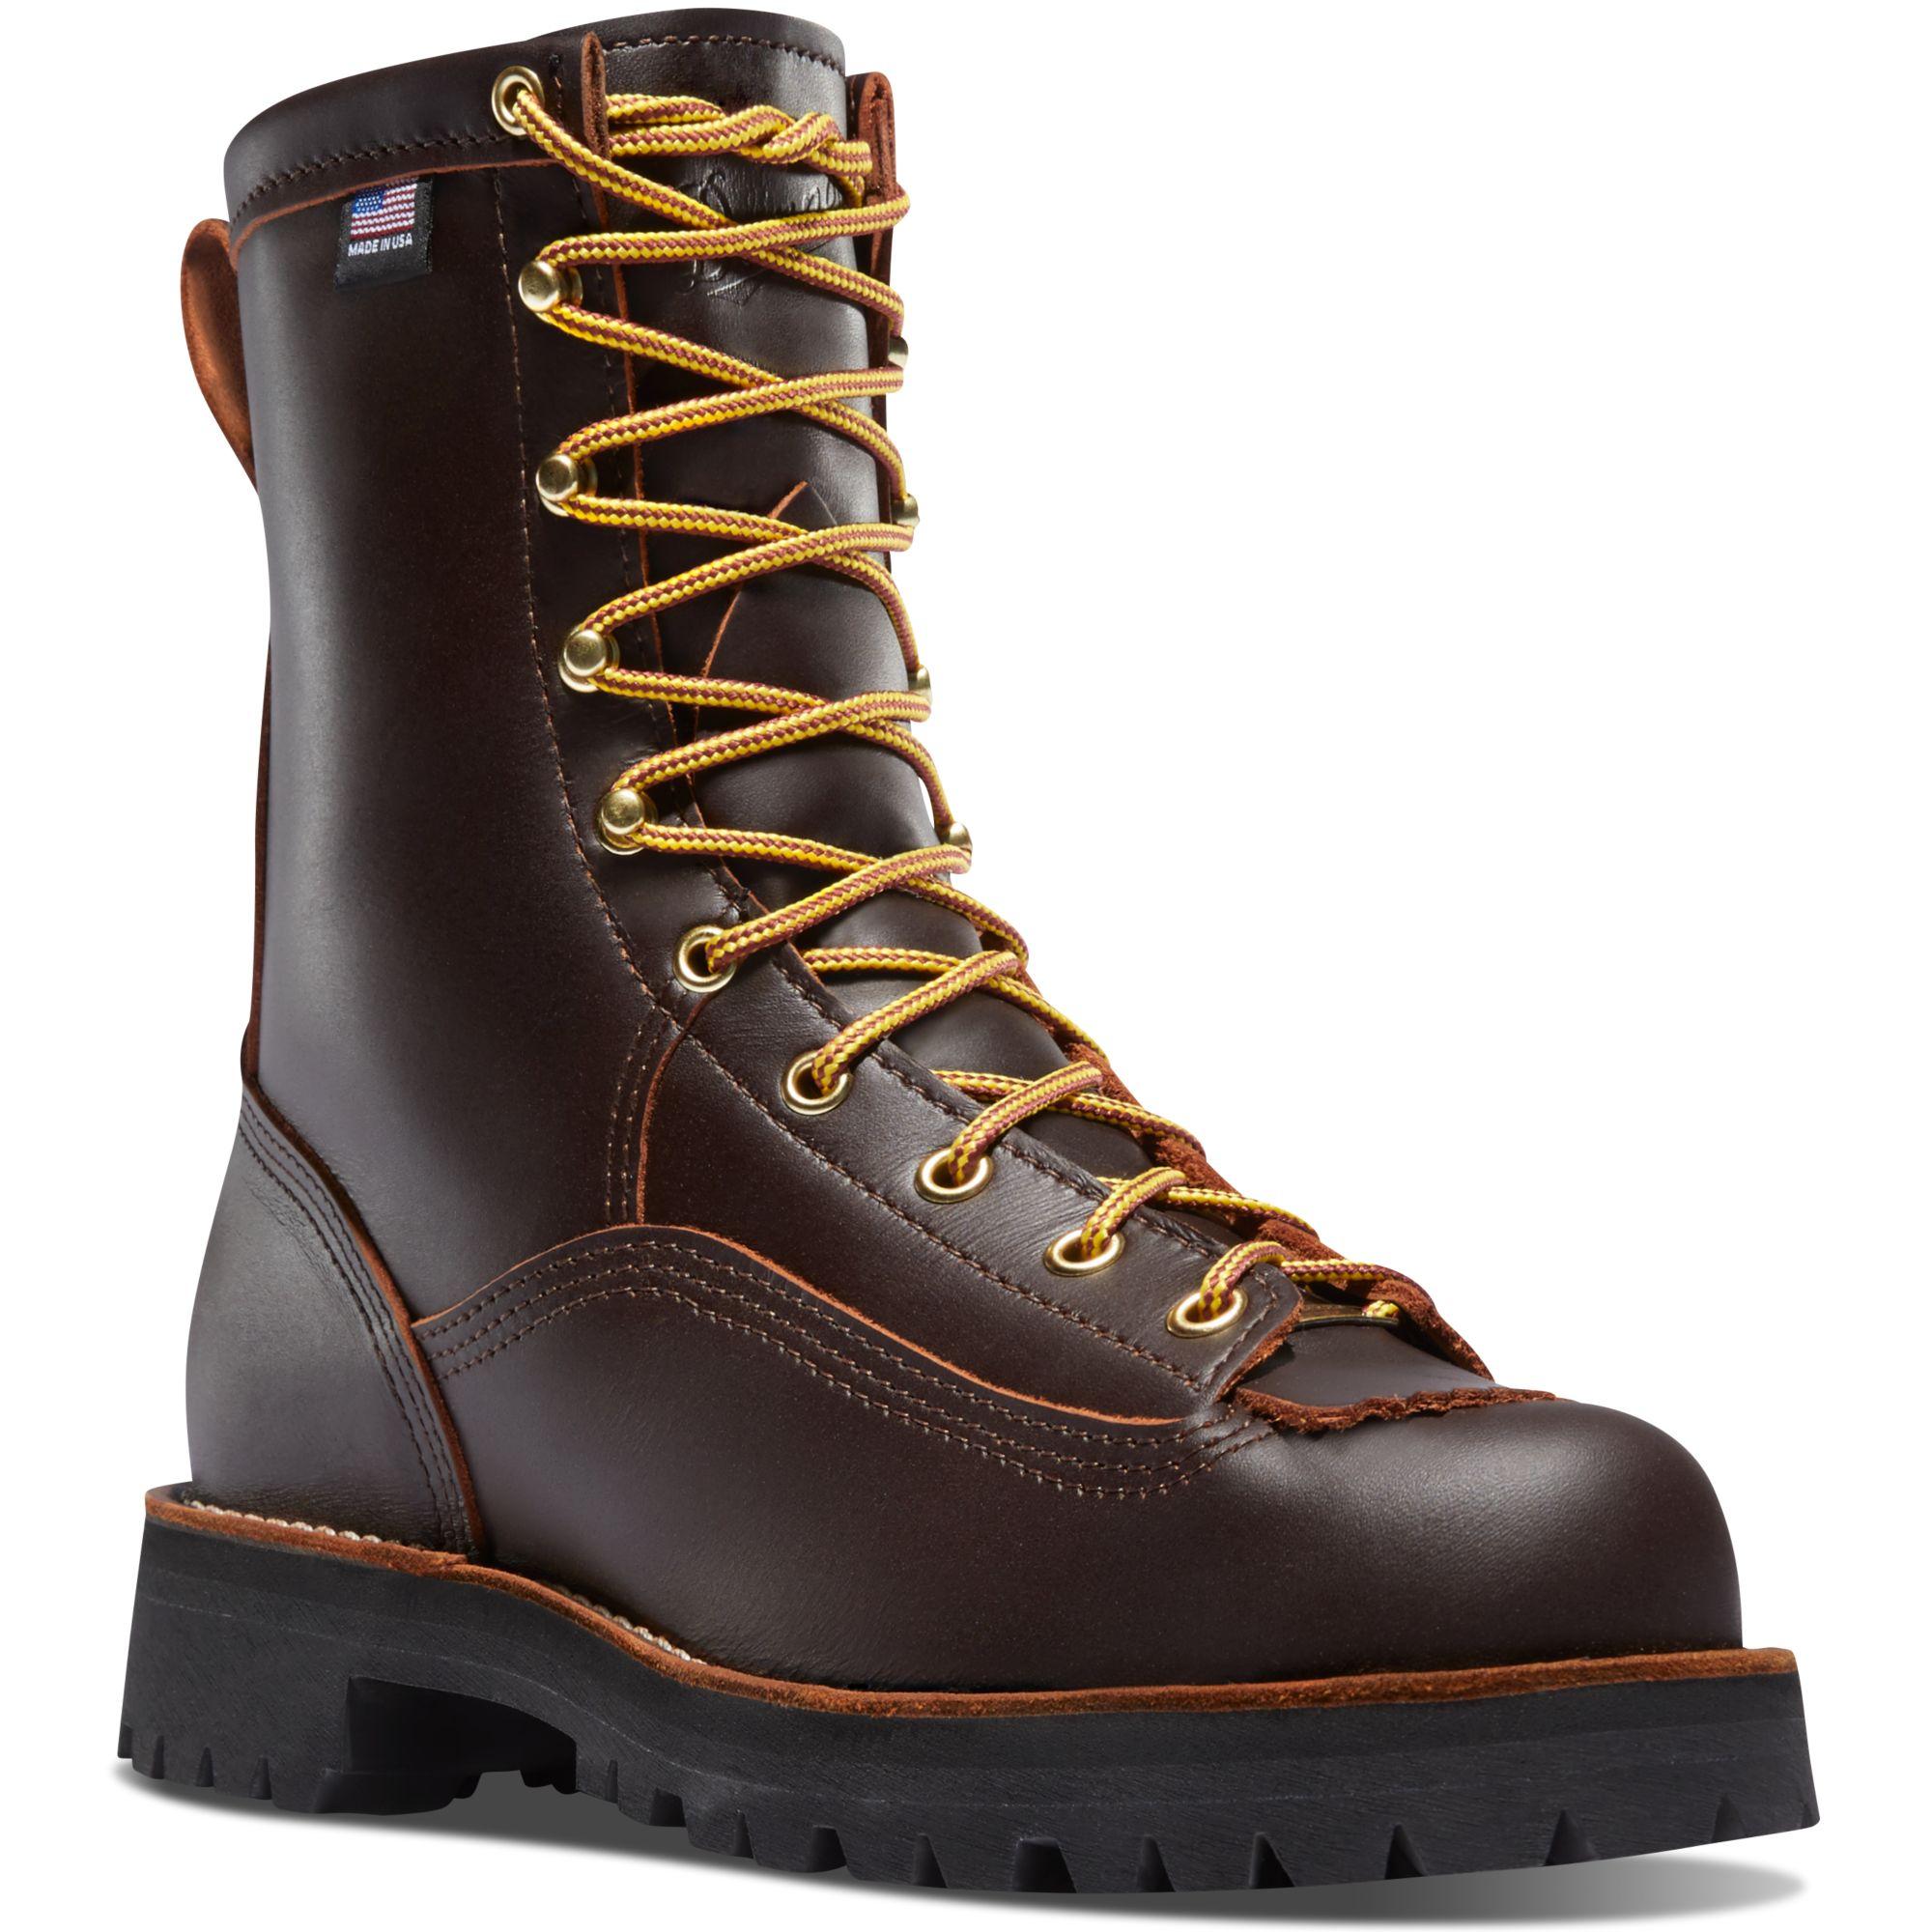 15584b7ec9f Danner Rain Forest Boots